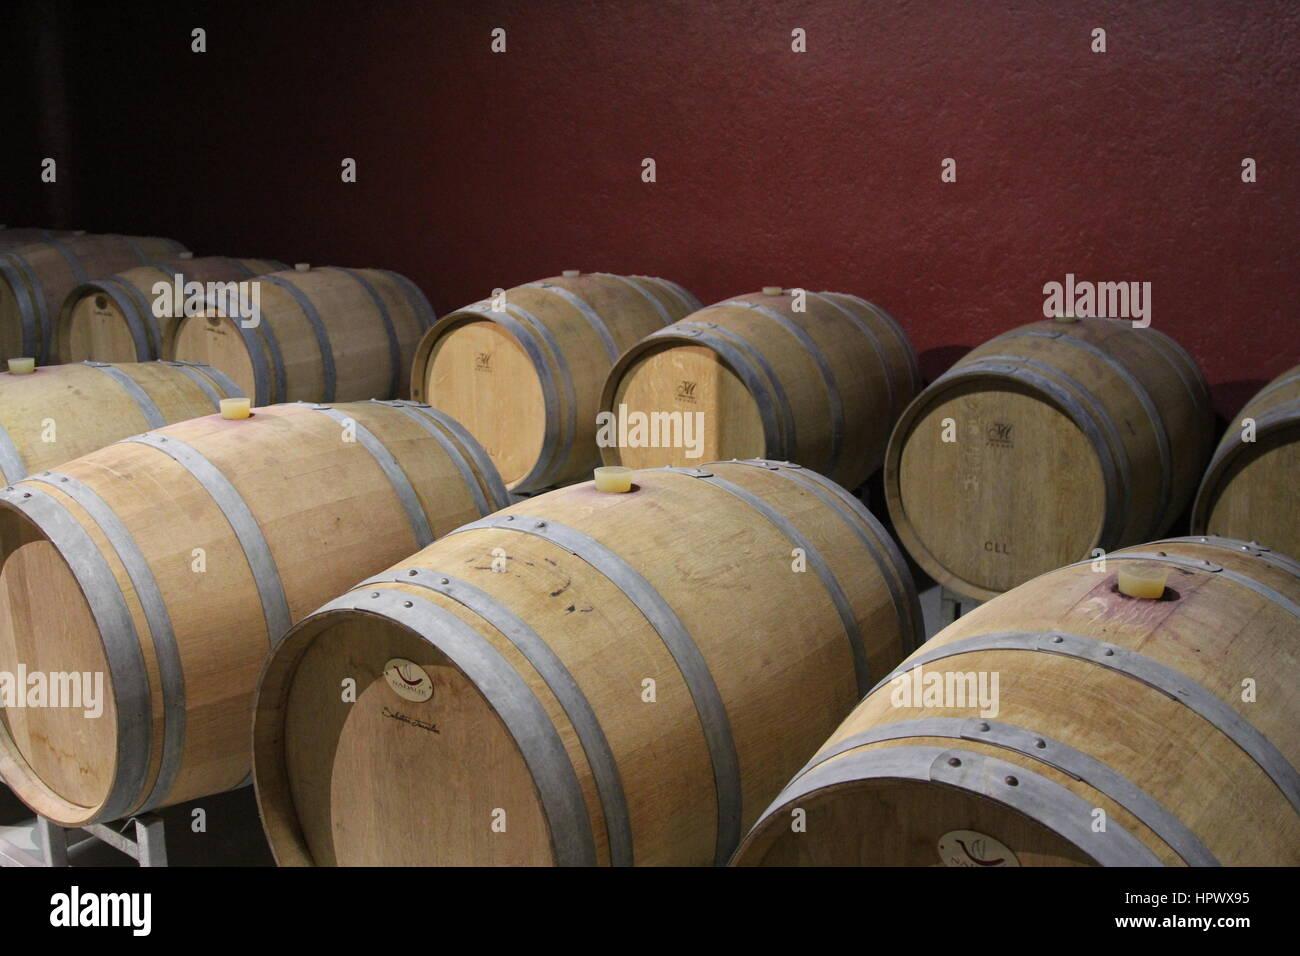 Mendoza Vineyard Cellar, Argentina - Stock Image